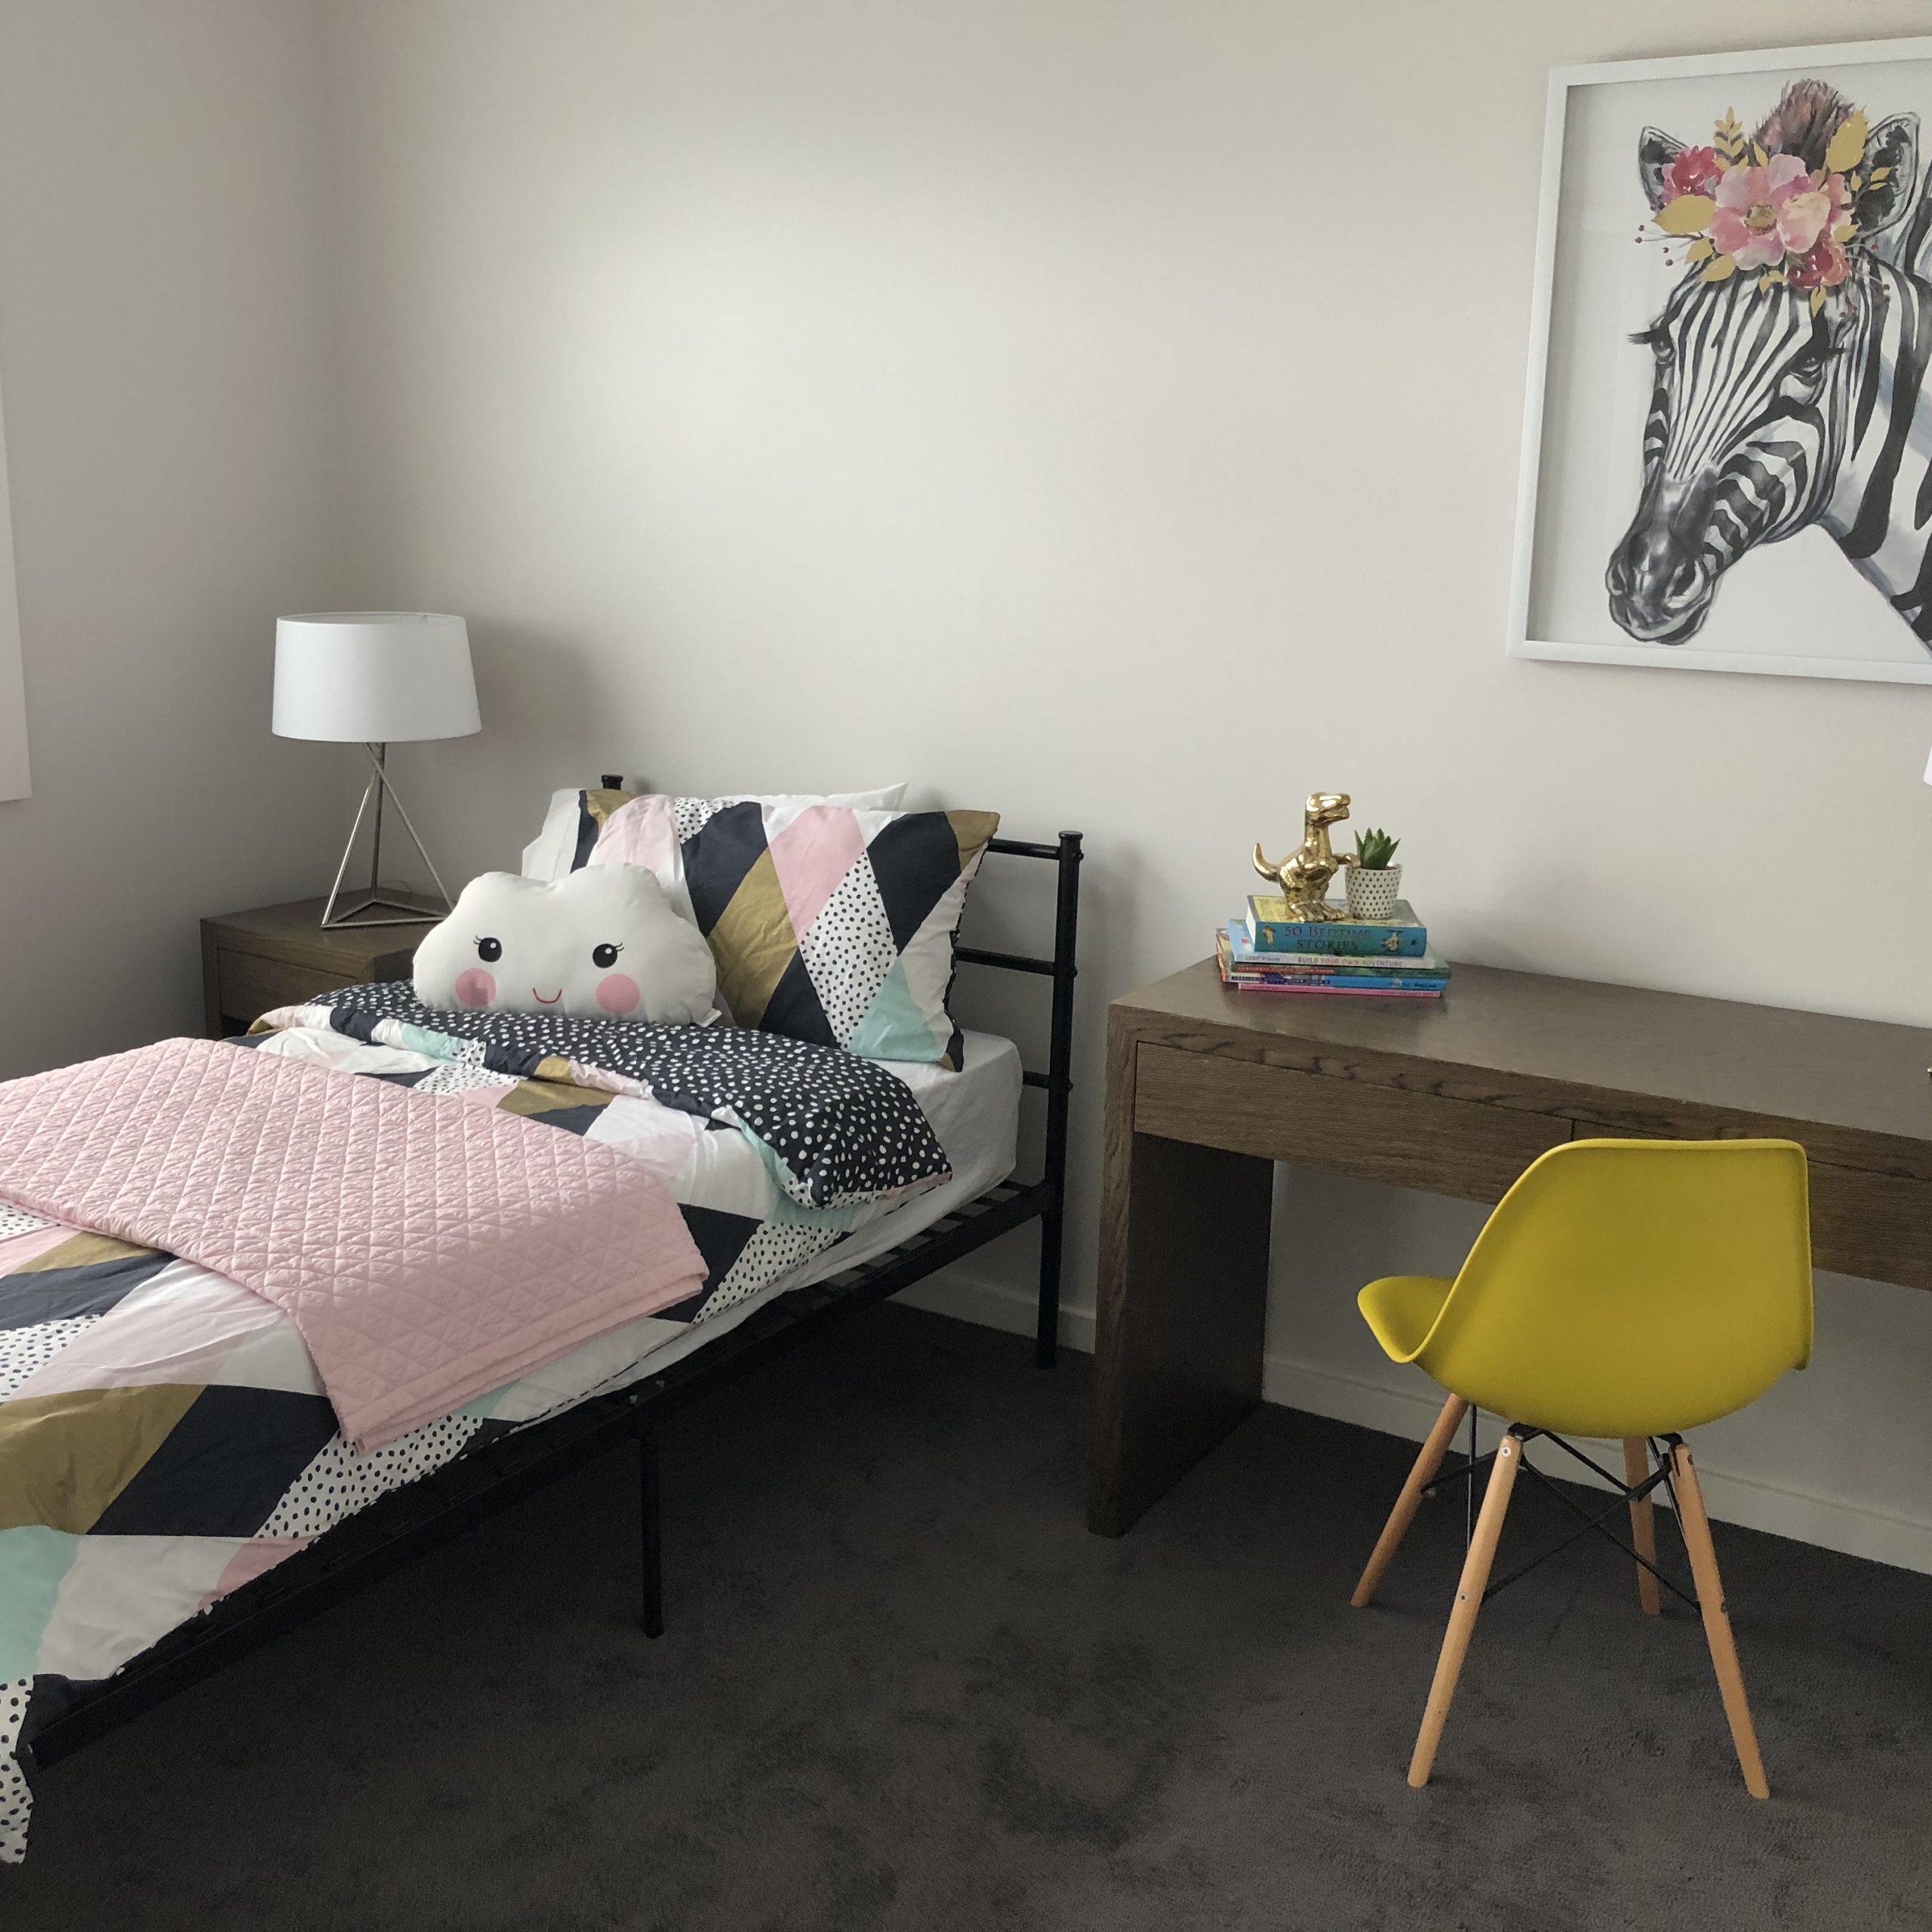 styled children's bedroom heidelberg heights townhouse